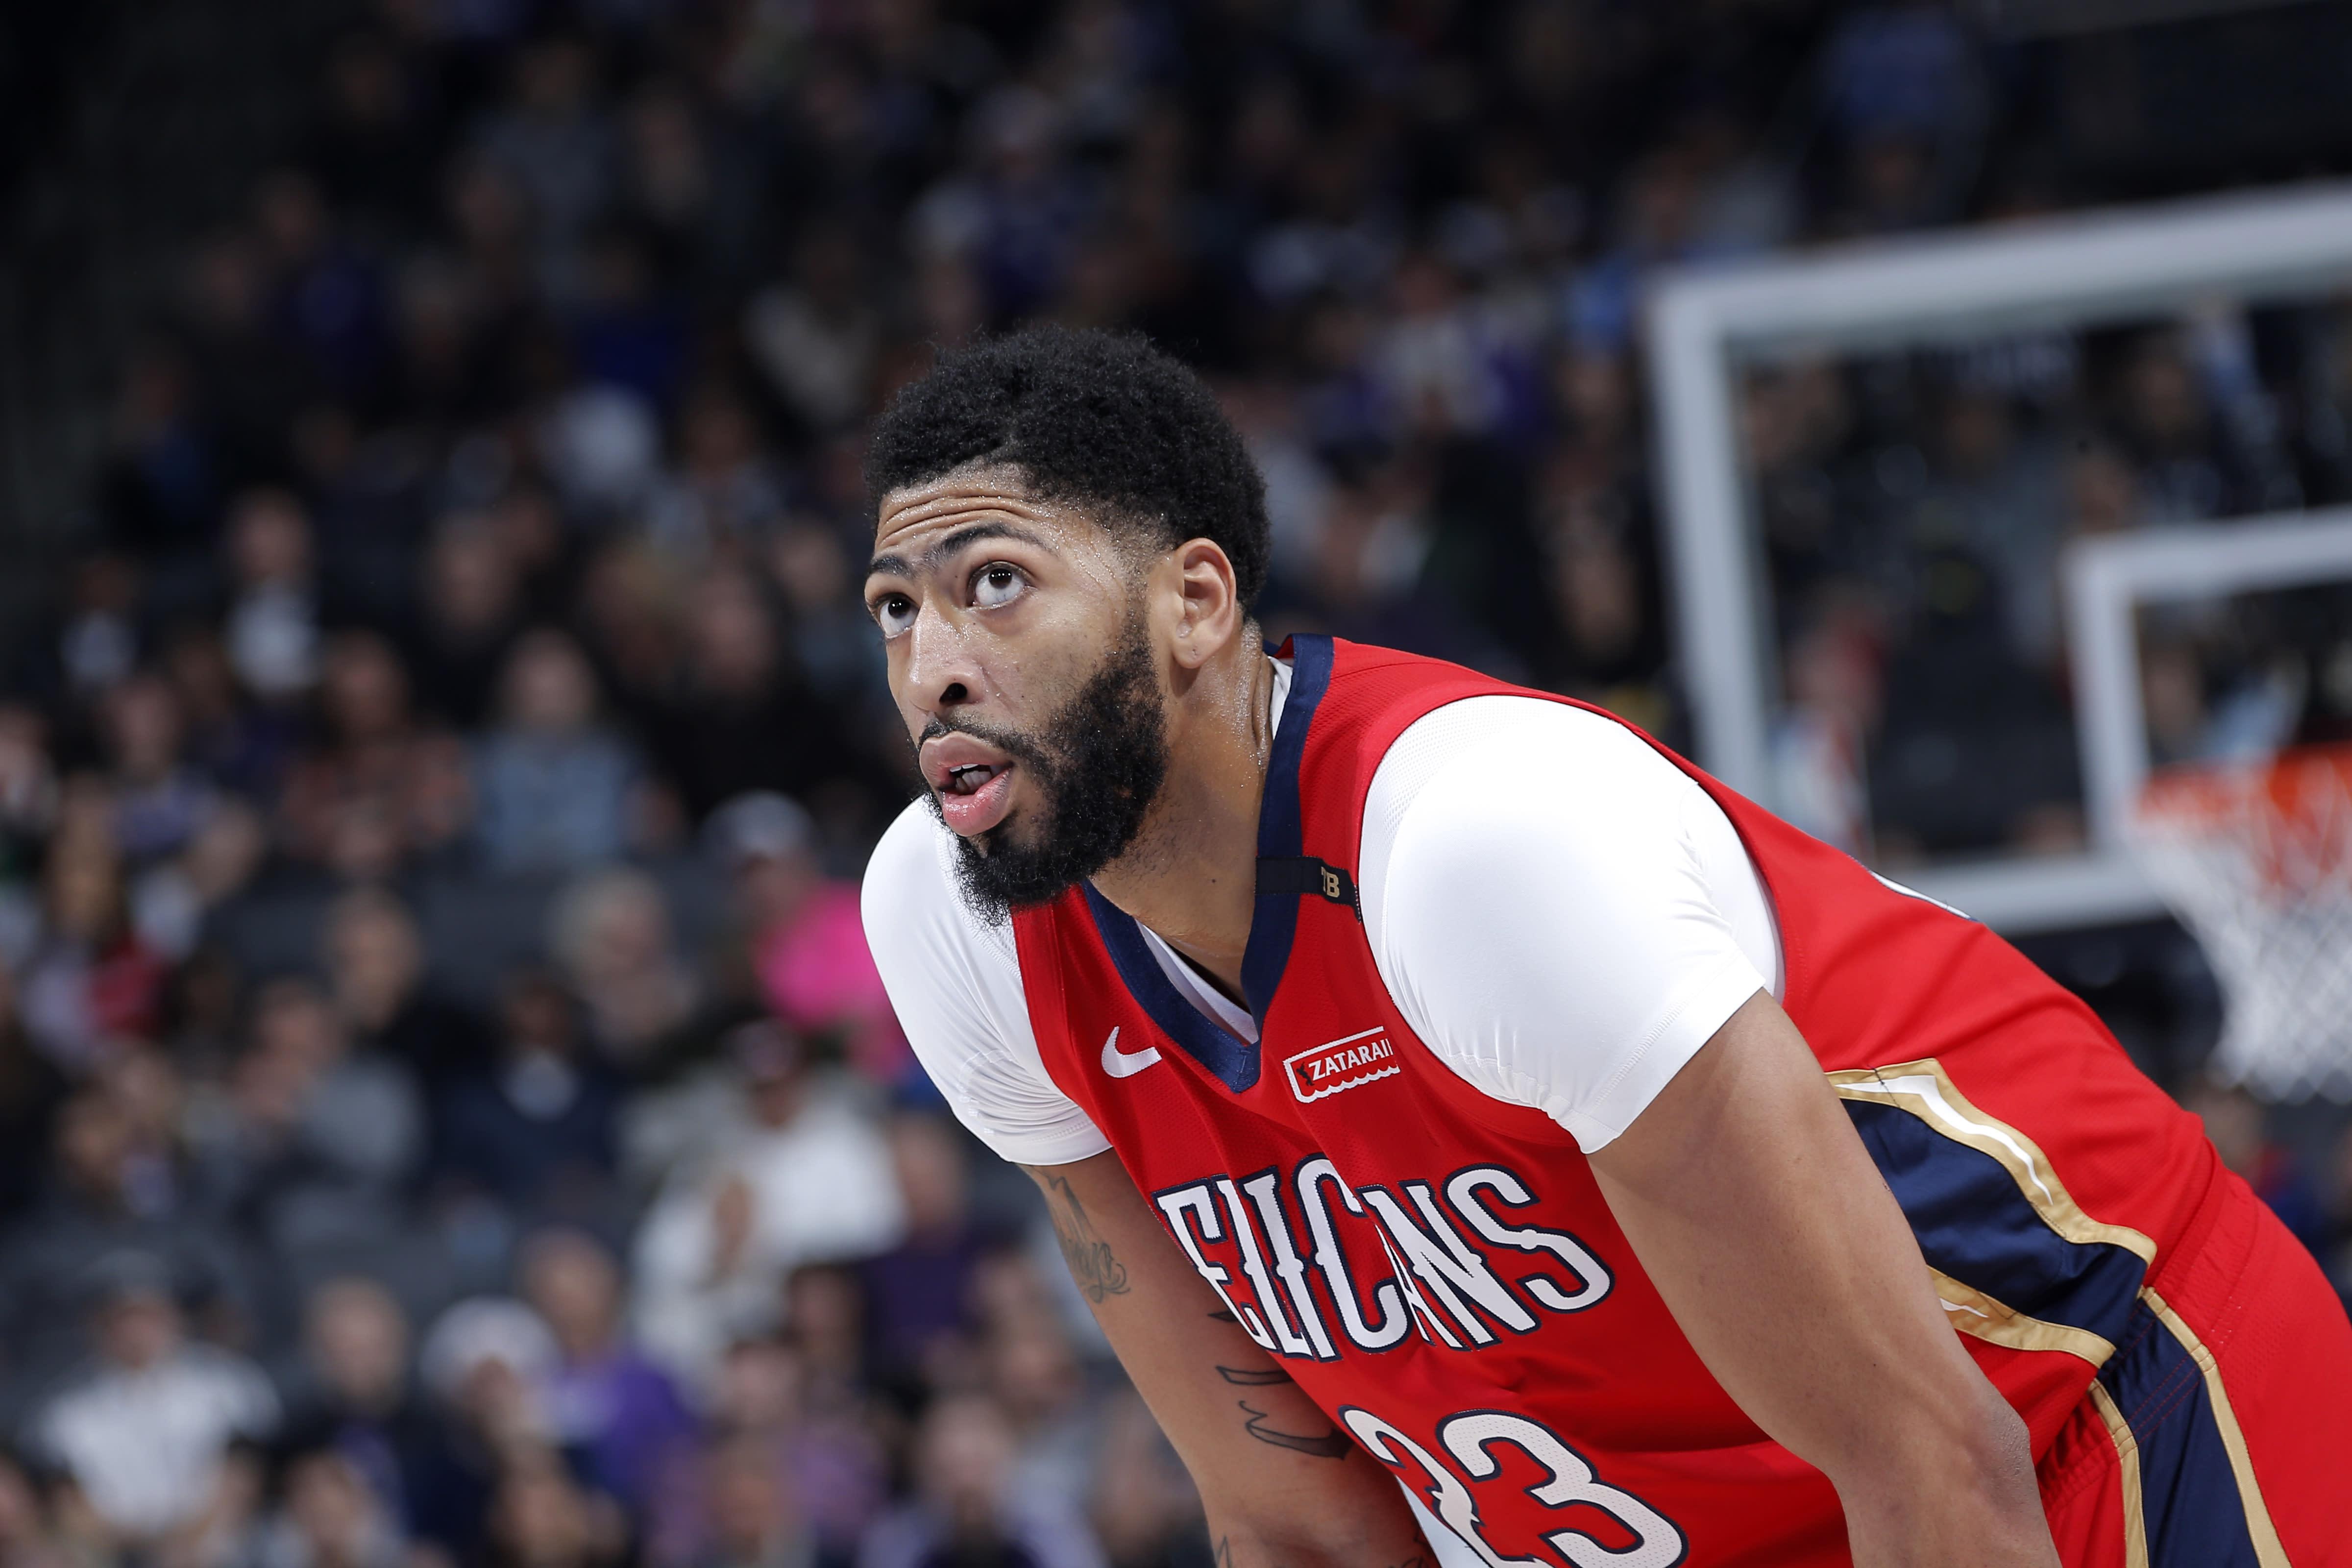 NBA》K.G建議A.D明年夏天加入湖人,你覺得他該去湖人嗎?